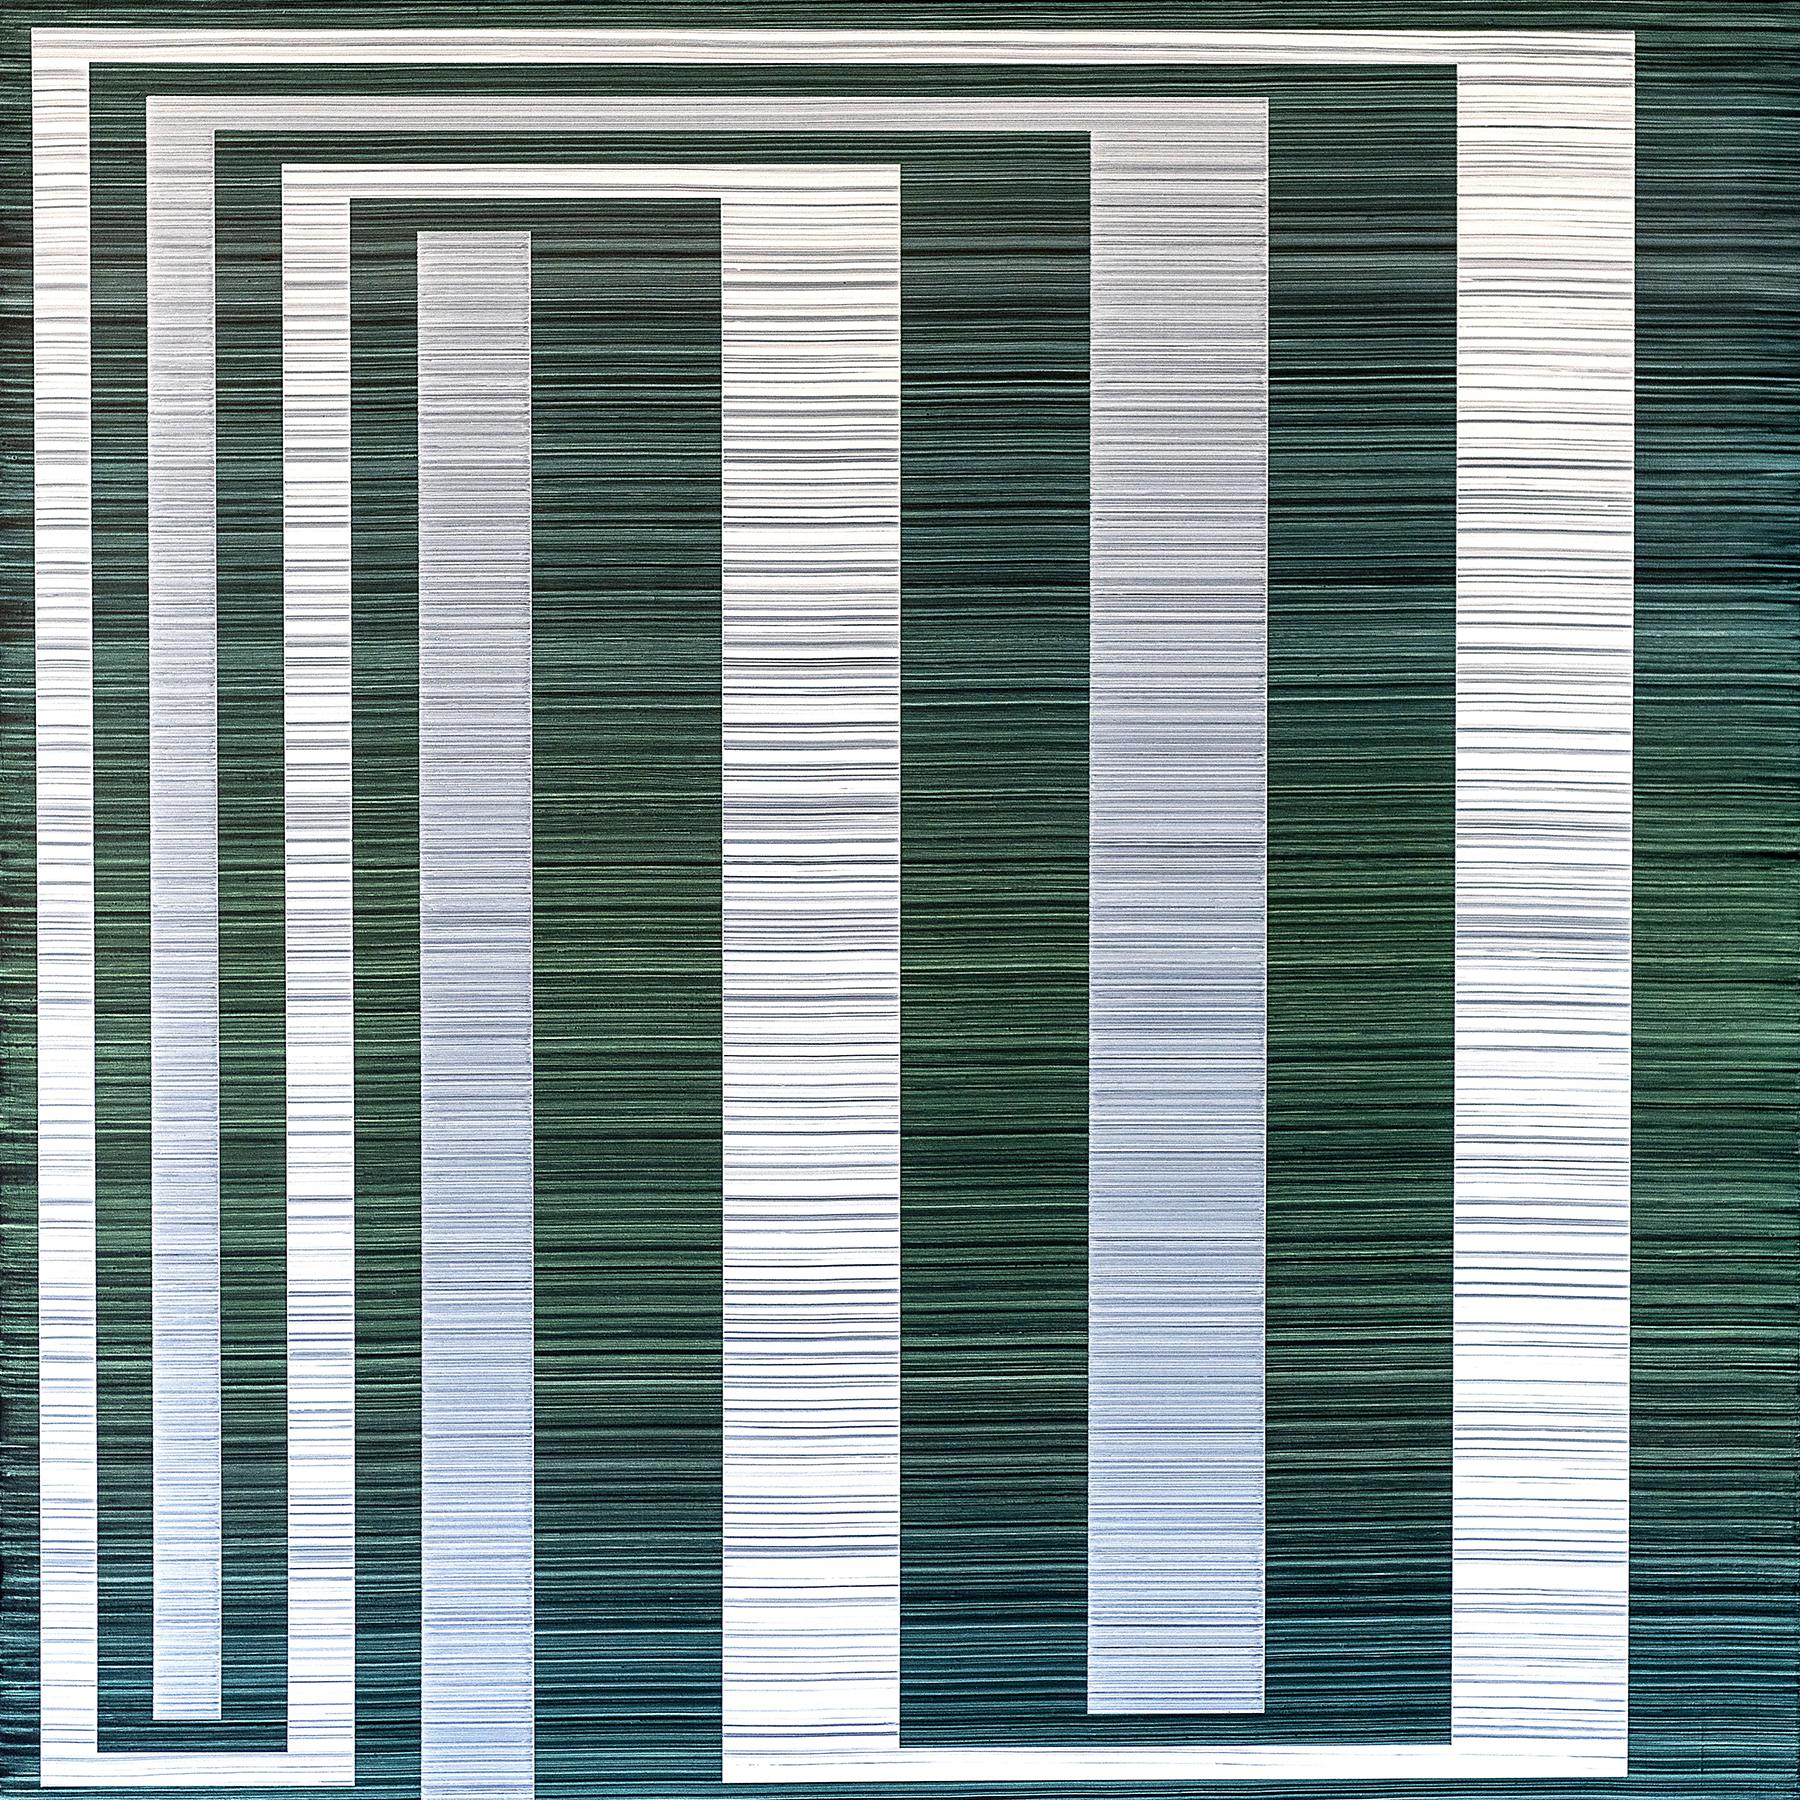 Bandwidth (Invidia), 39 x 39 inches / 99 x 99 cm, acrylic on muslin on panel, 2019